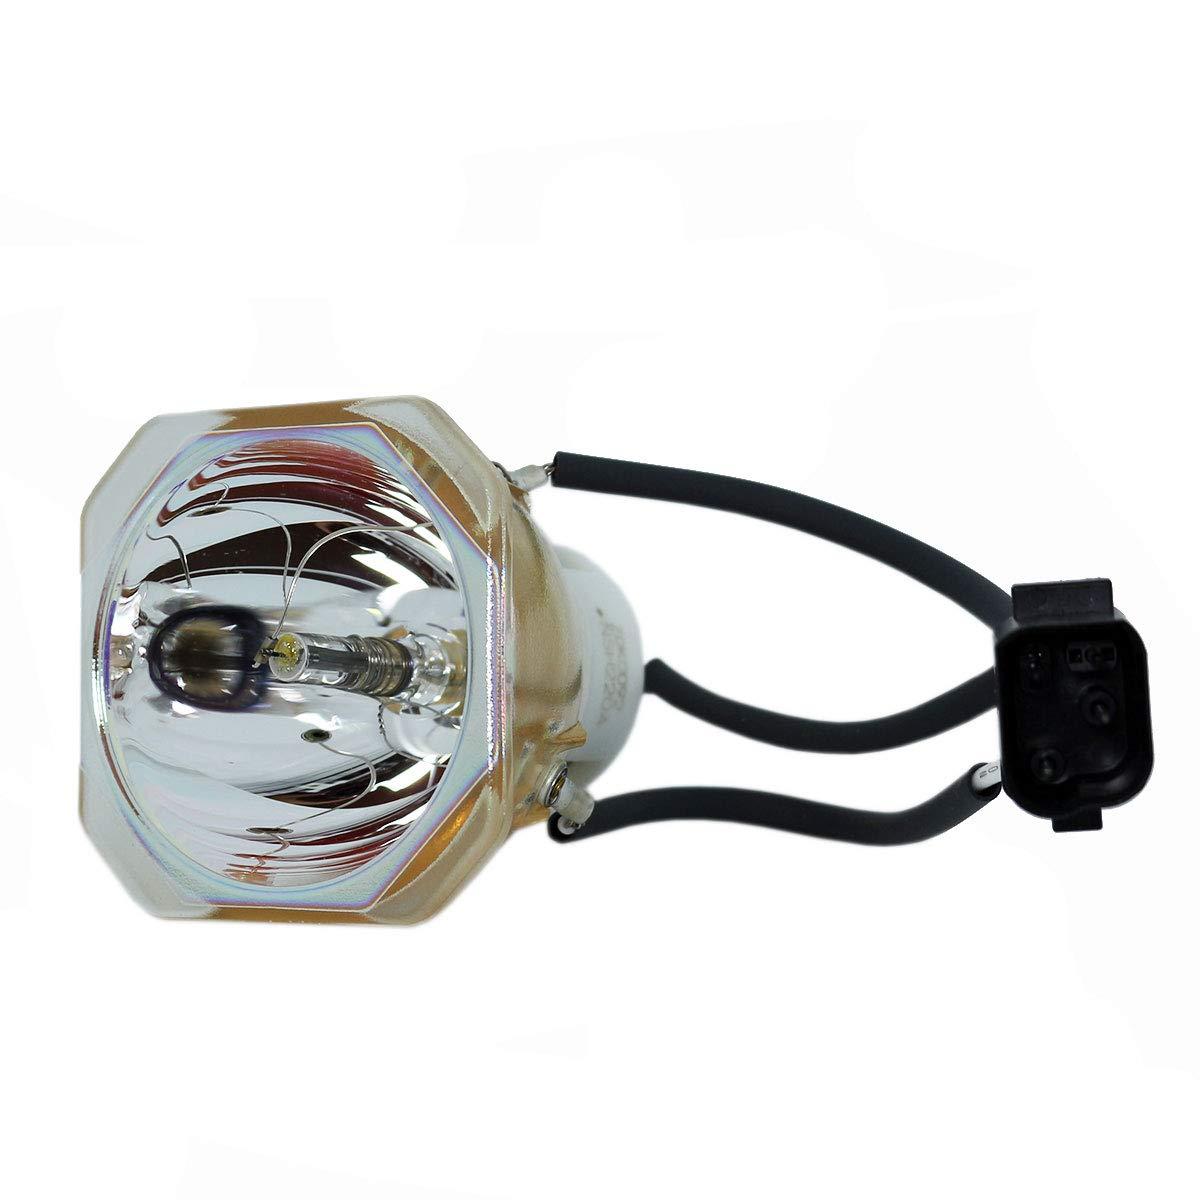 SpArc 交換用プロジェクターランプ 囲い/電球付き NEC LT260用 Platinum (Brighter/Durable) Platinum (Brighter/Durable) Lamp Only B07MPTCLWN